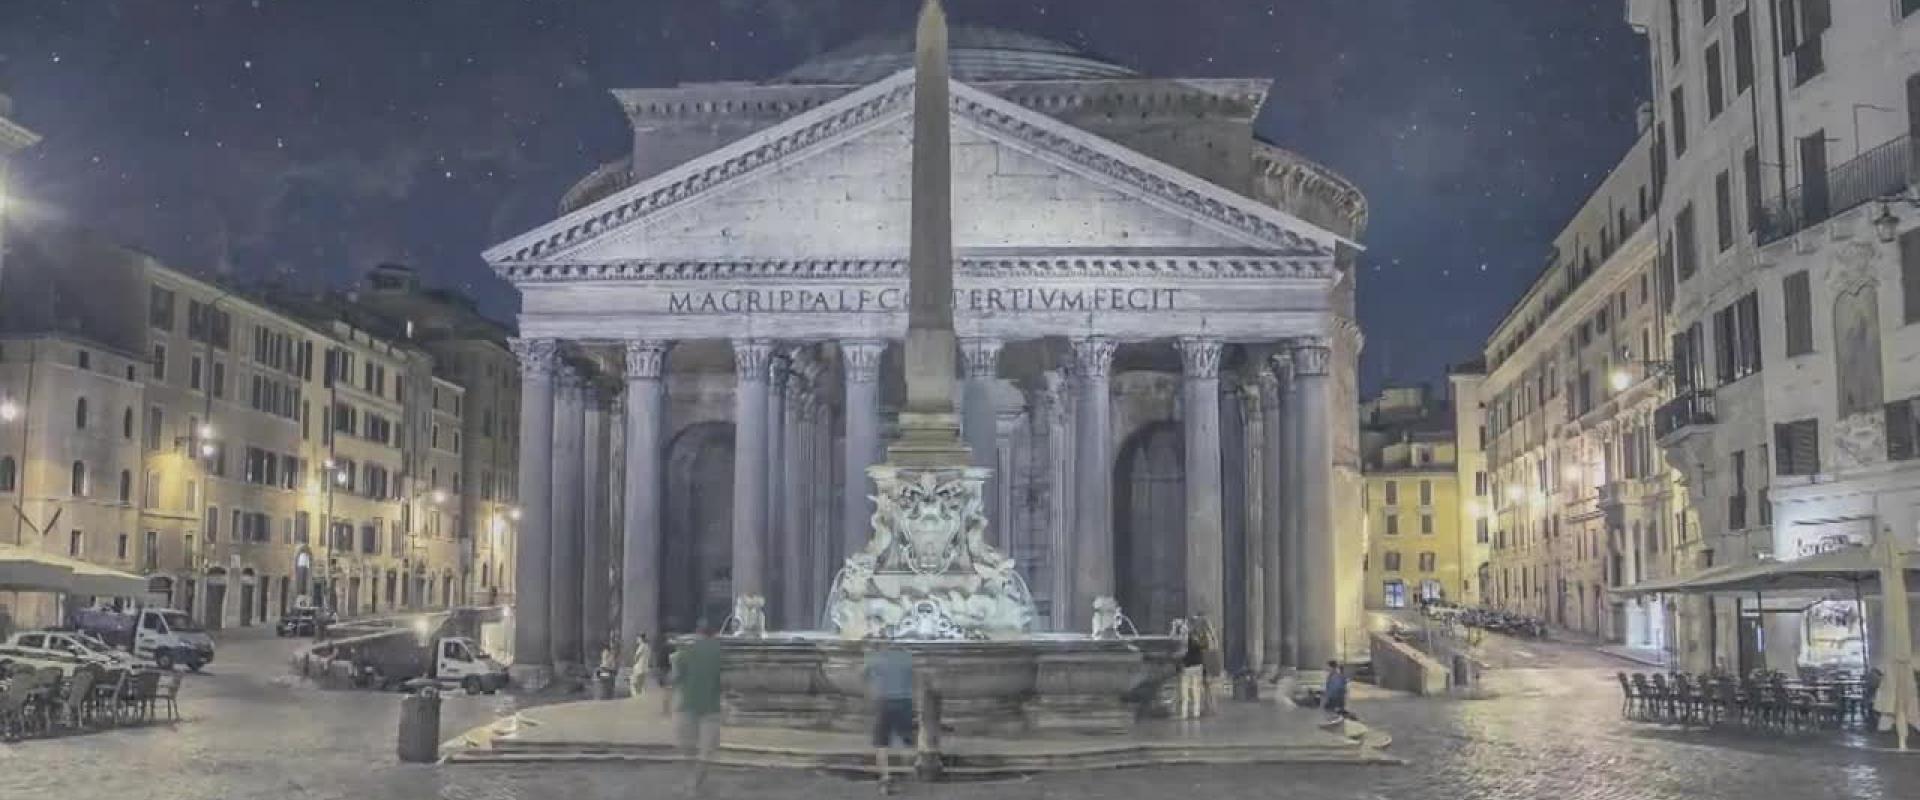 Roma timelapse